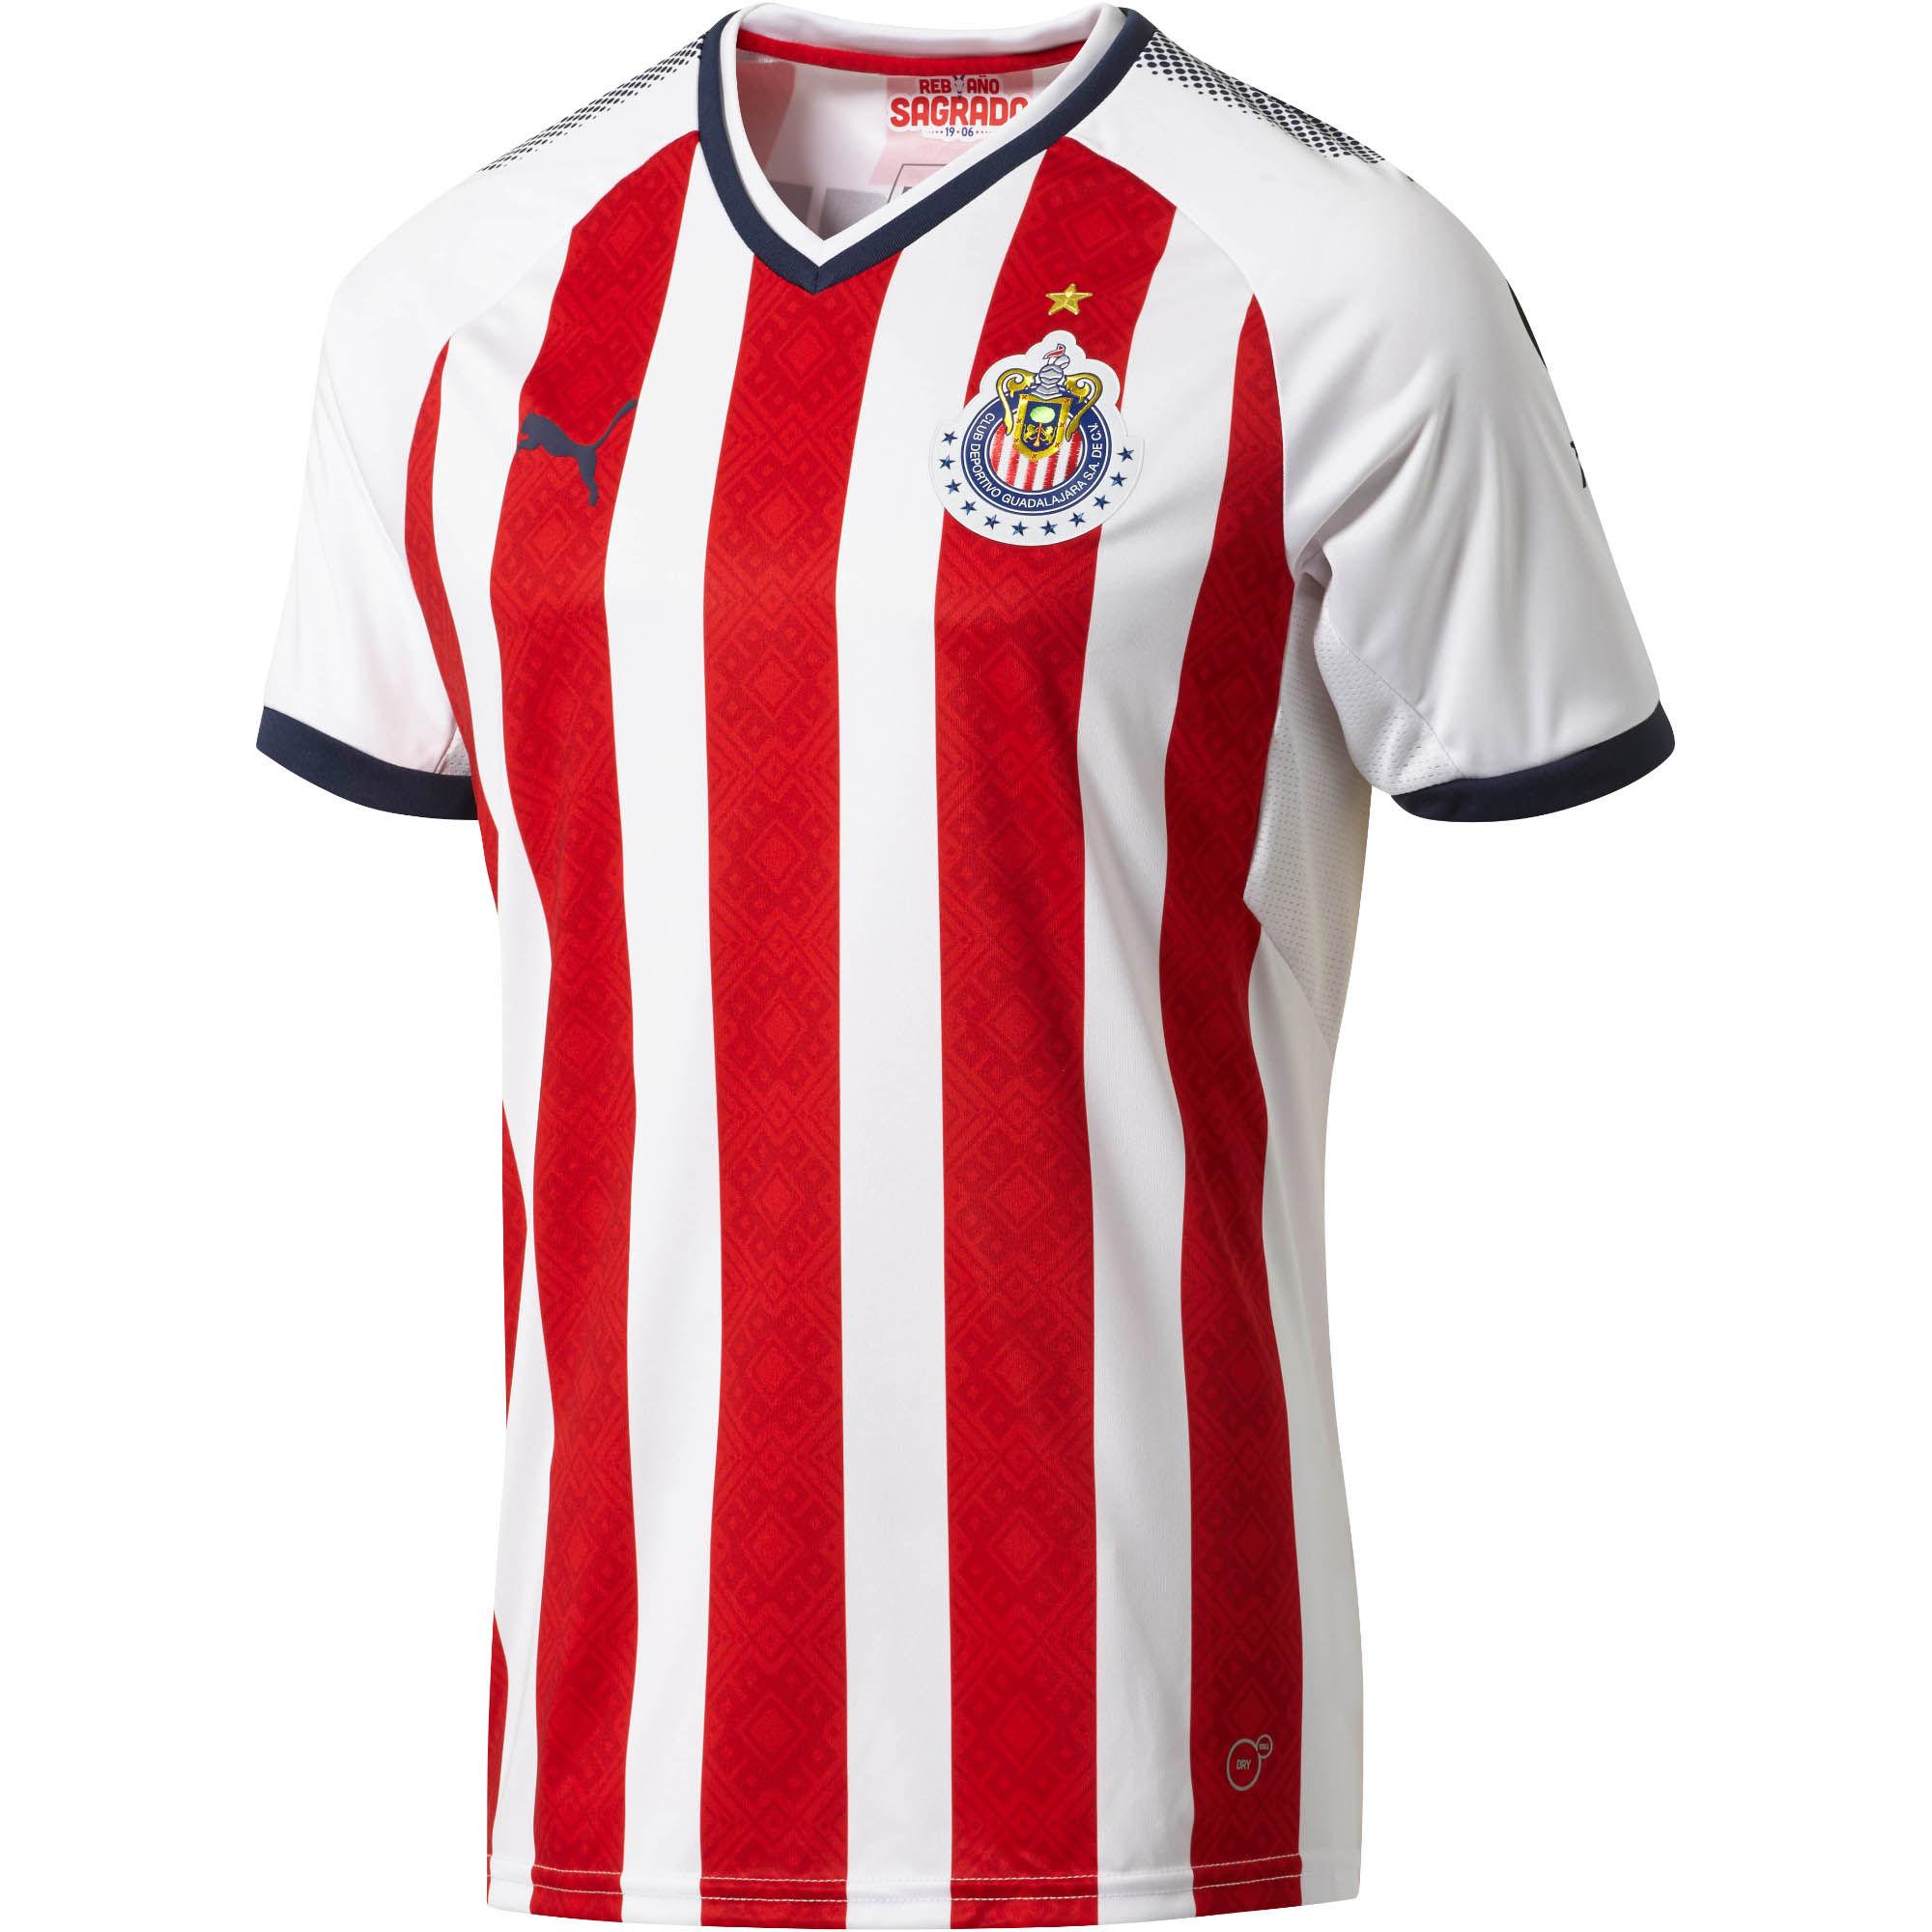 differently abffc 11b6a Chivas 17/18 Puma Home Kit | 17/18 Kits | Football shirt blog